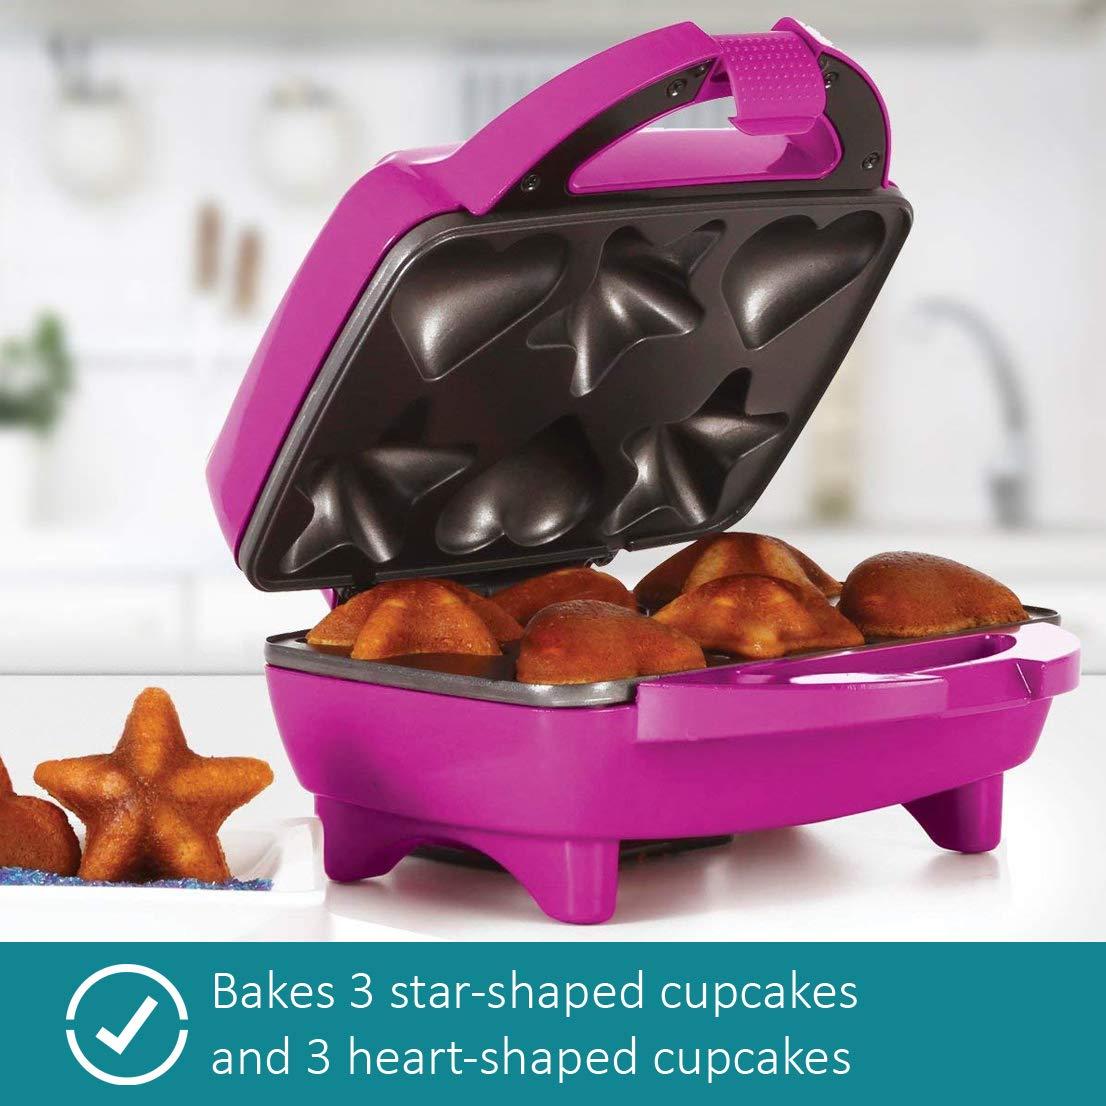 Holstein Housewares HF-09034M Star & Heart Cupcake Maker - Magenta by Holstein Housewares (Image #4)